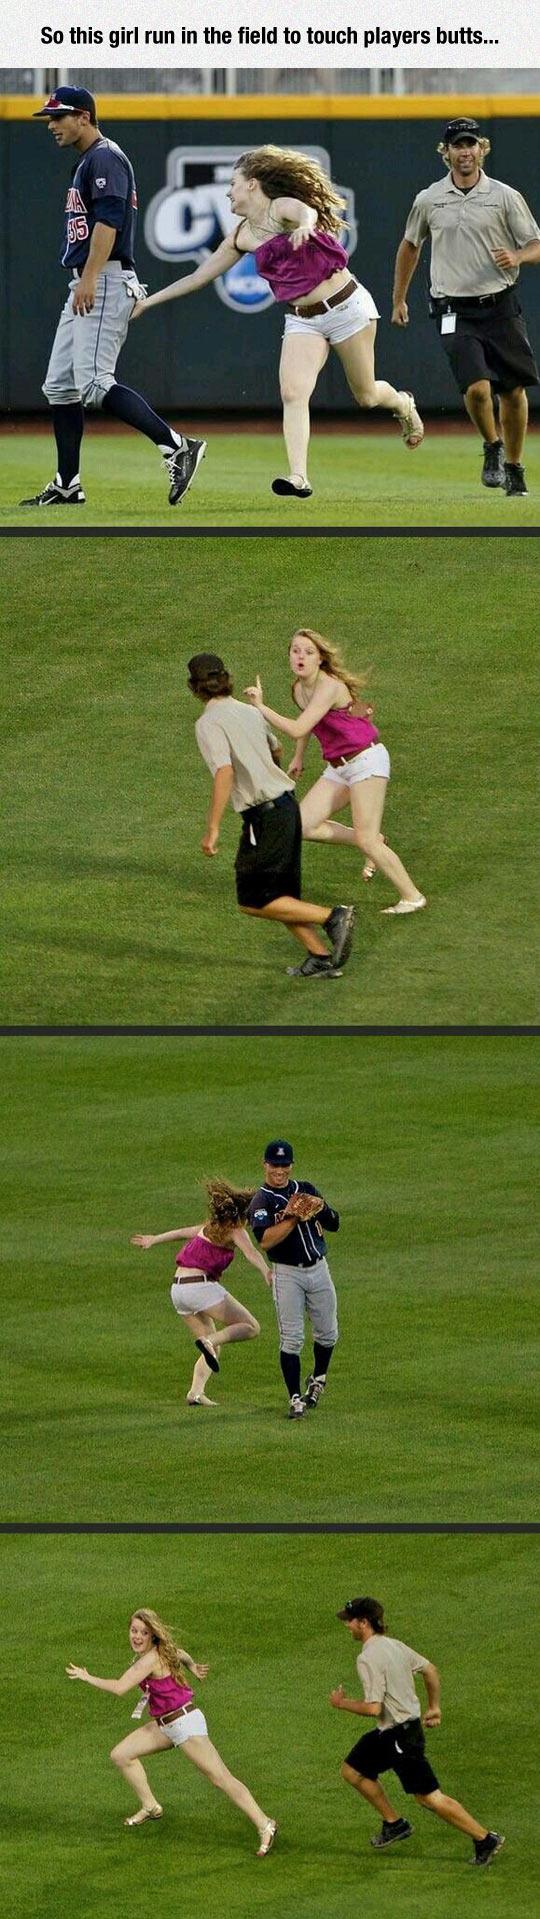 funny-girl-run-field-players